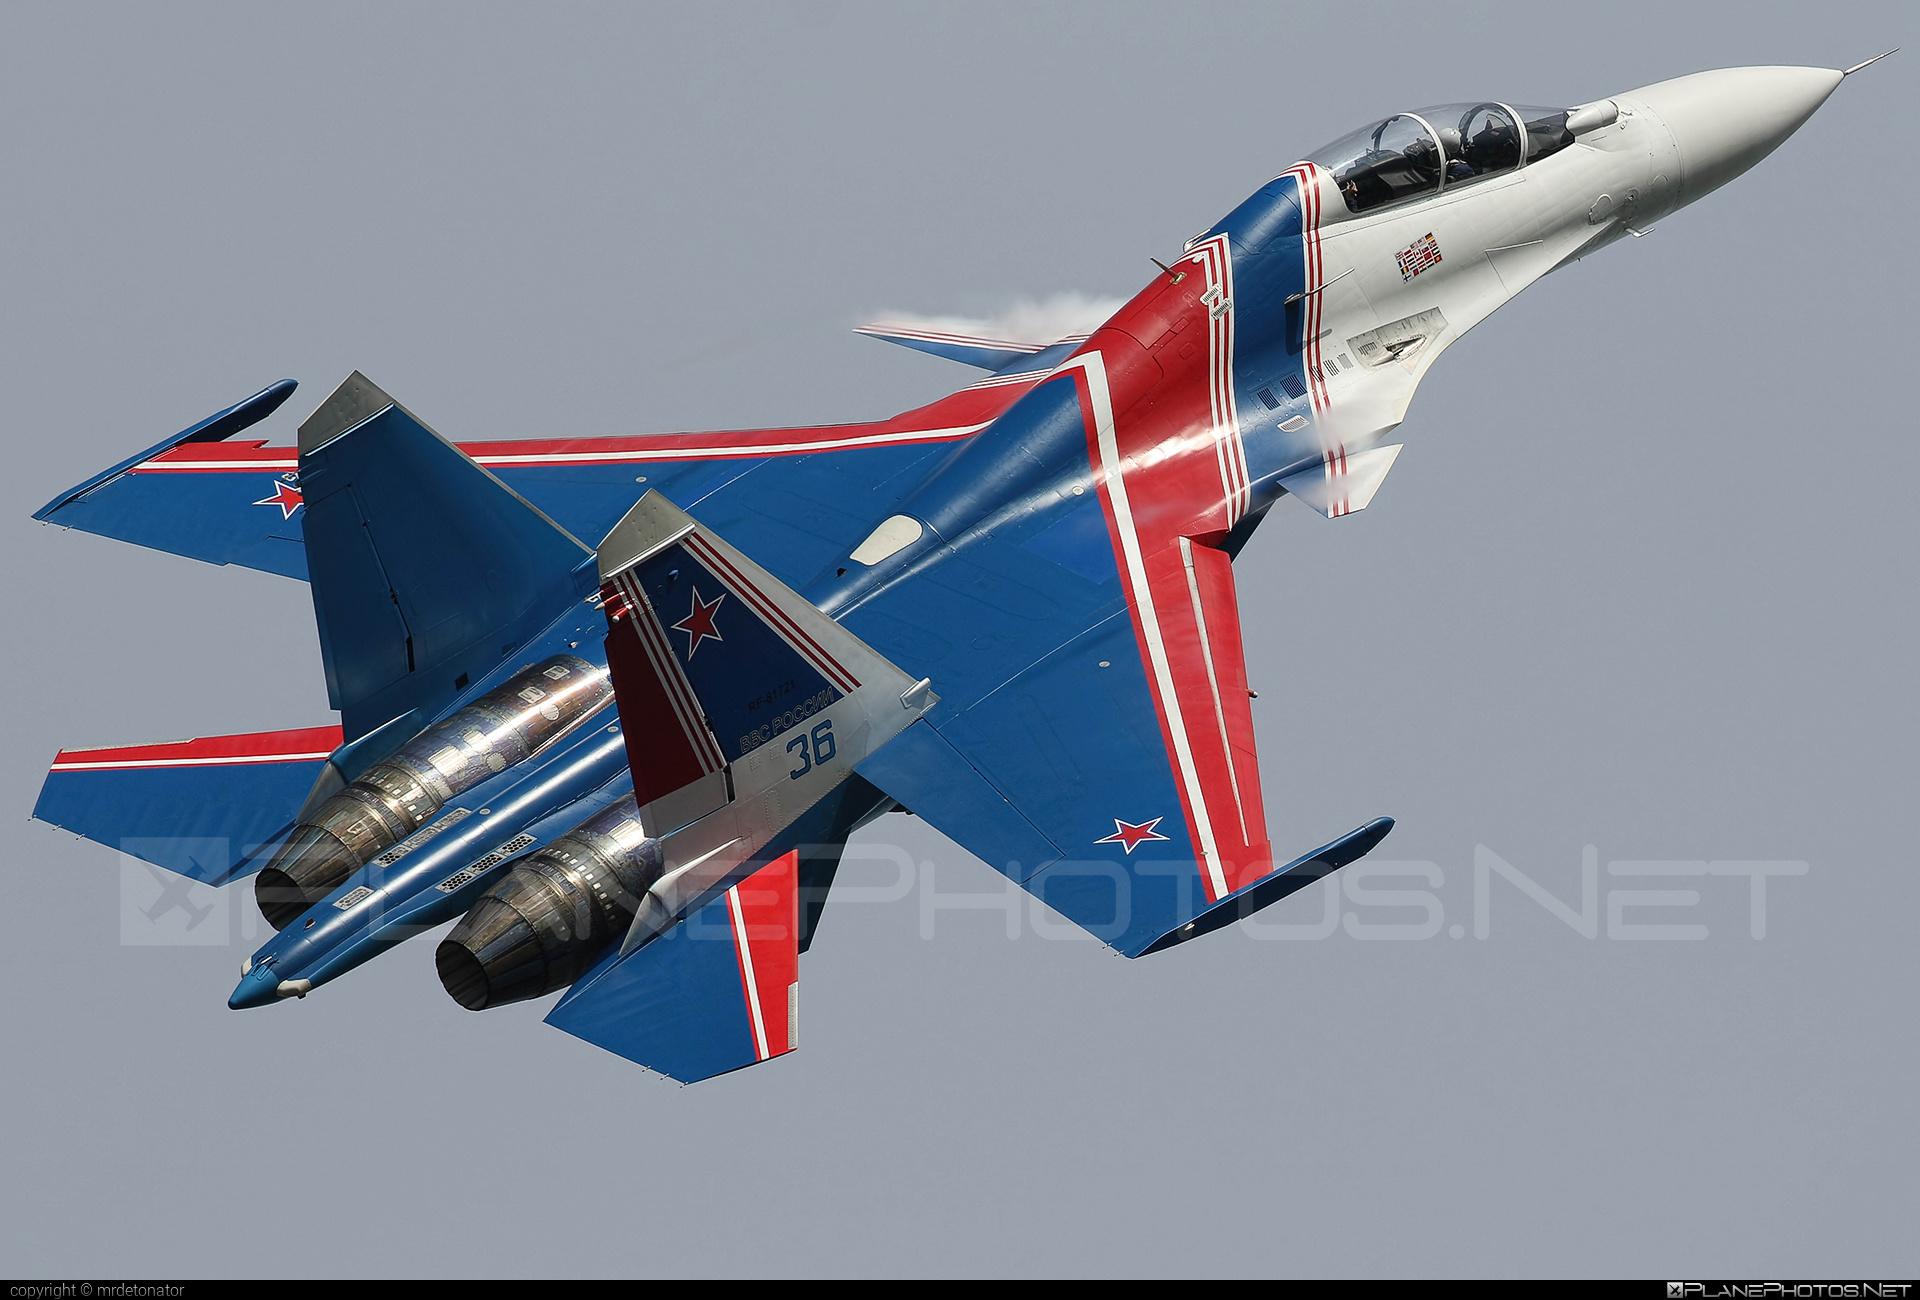 Sukhoi Su-30SM - RF-81721 operated by Voyenno-vozdushnye sily Rossii (Russian Air Force) #maks2017 #russianknights #russkiyevityazi #su30 #su30sm #sukhoi #sukhoi30 #sukhoisu30sm